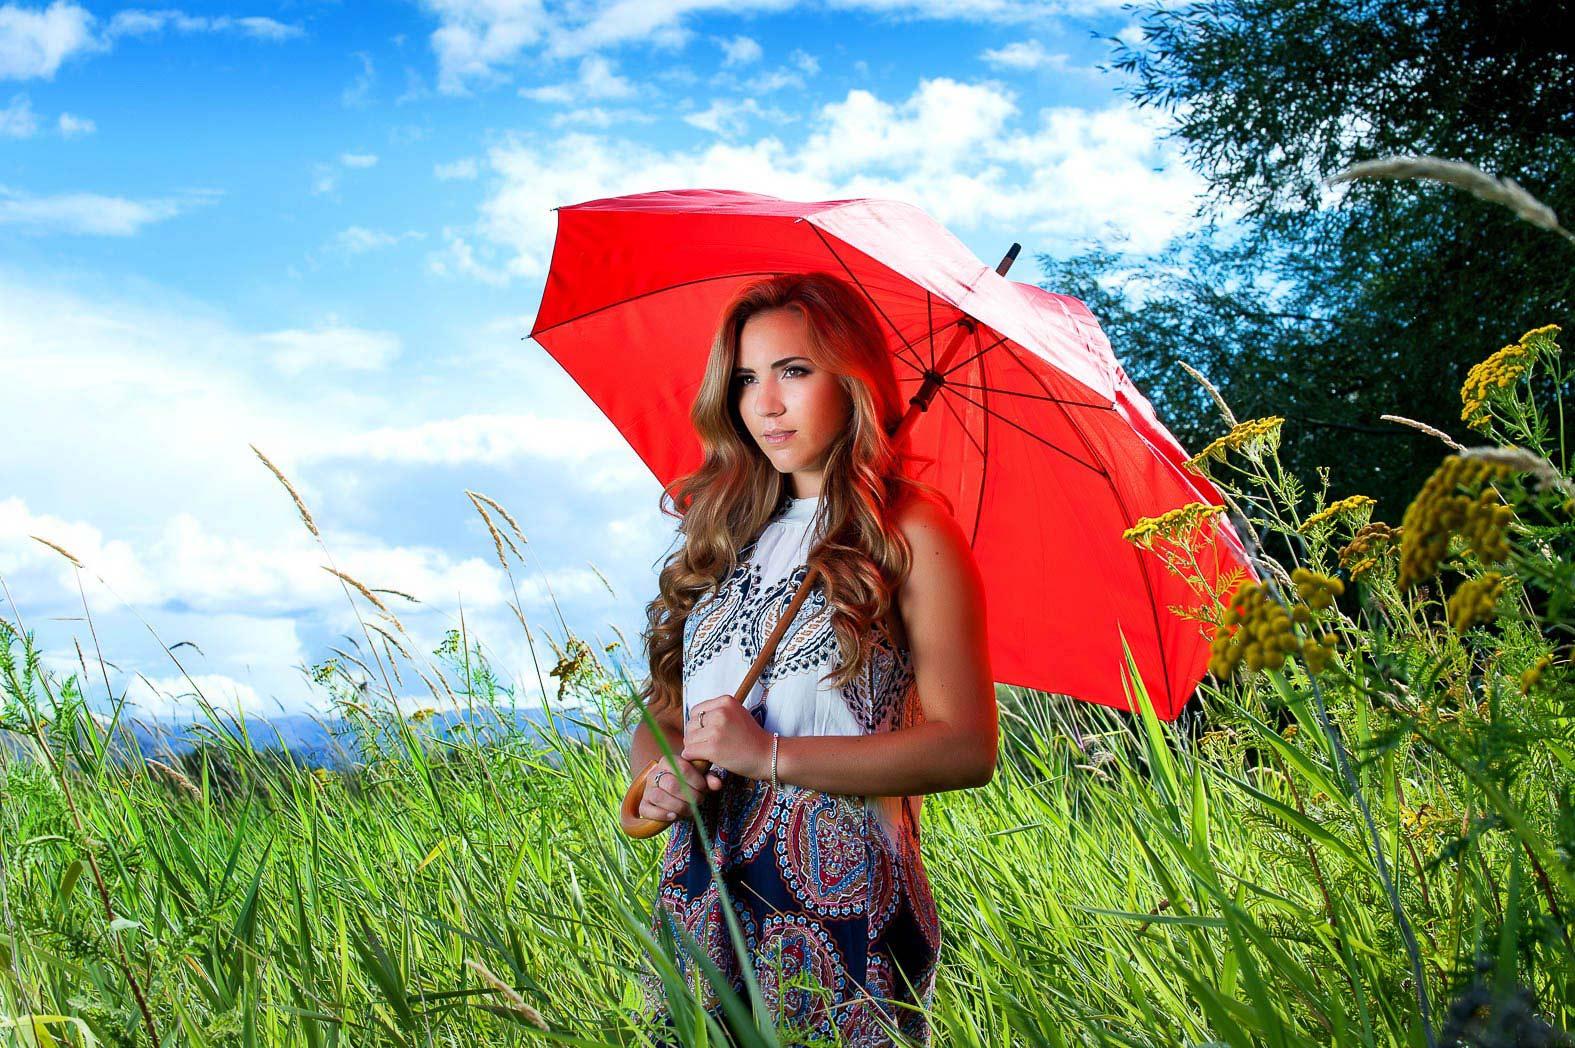 senior-picture-posing-girl-holding-red-umbrella